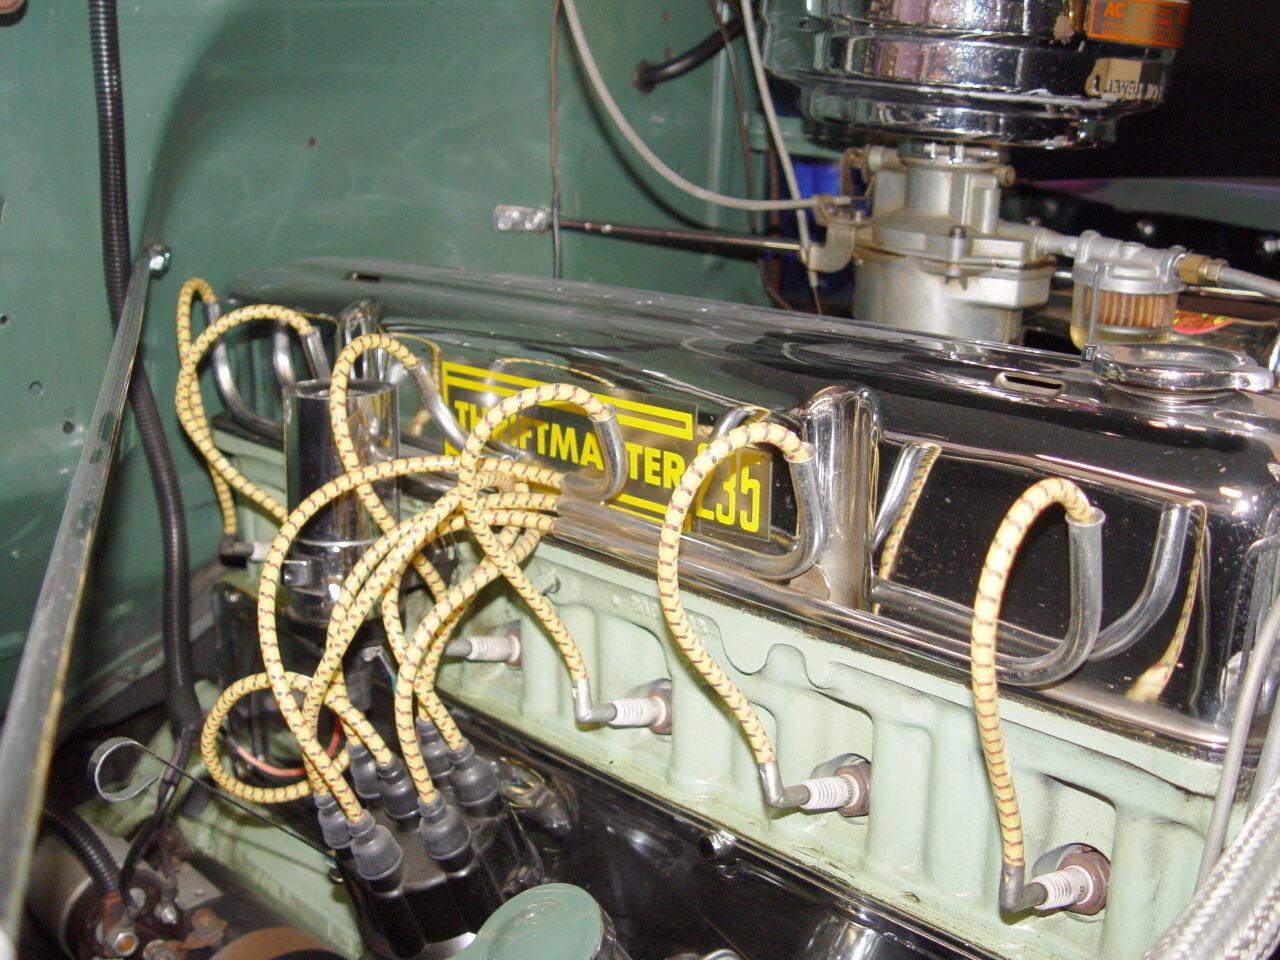 CHEVROLET 216 235 250 ACCESSORY SPARK PLUG WIRE LOOM CHROME COVERS ...